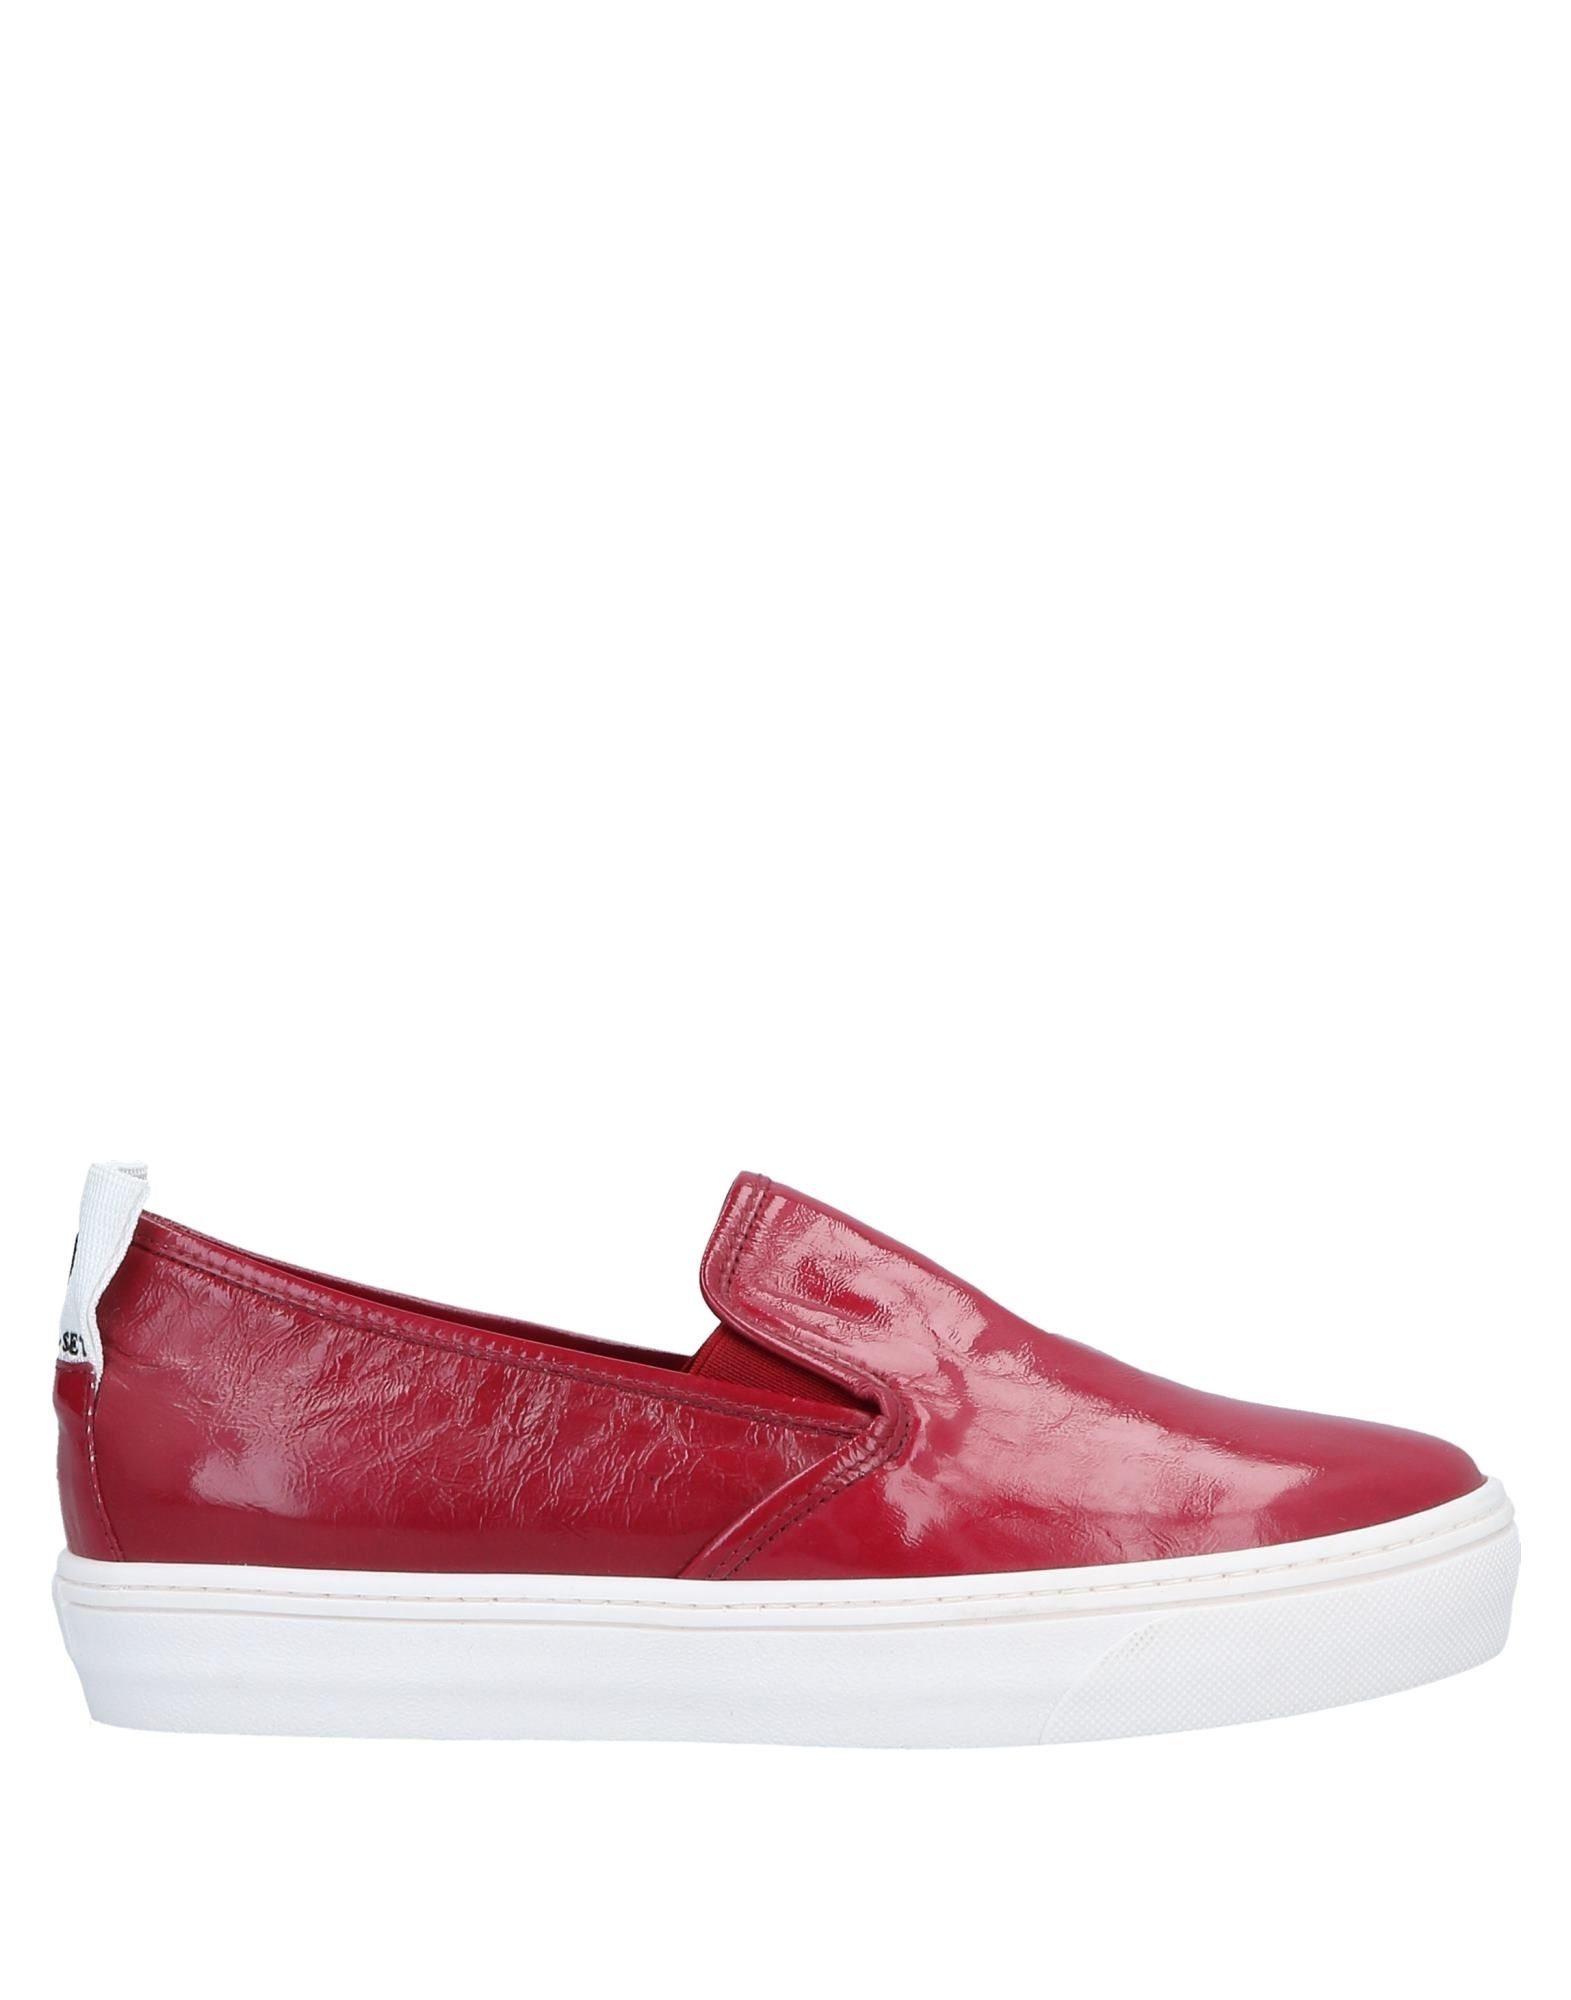 Twin-Set Simona Barbieri Sneakers - Women Twin-Set Simona  Barbieri Sneakers online on  Simona Canada - 11561341FV 1569e4